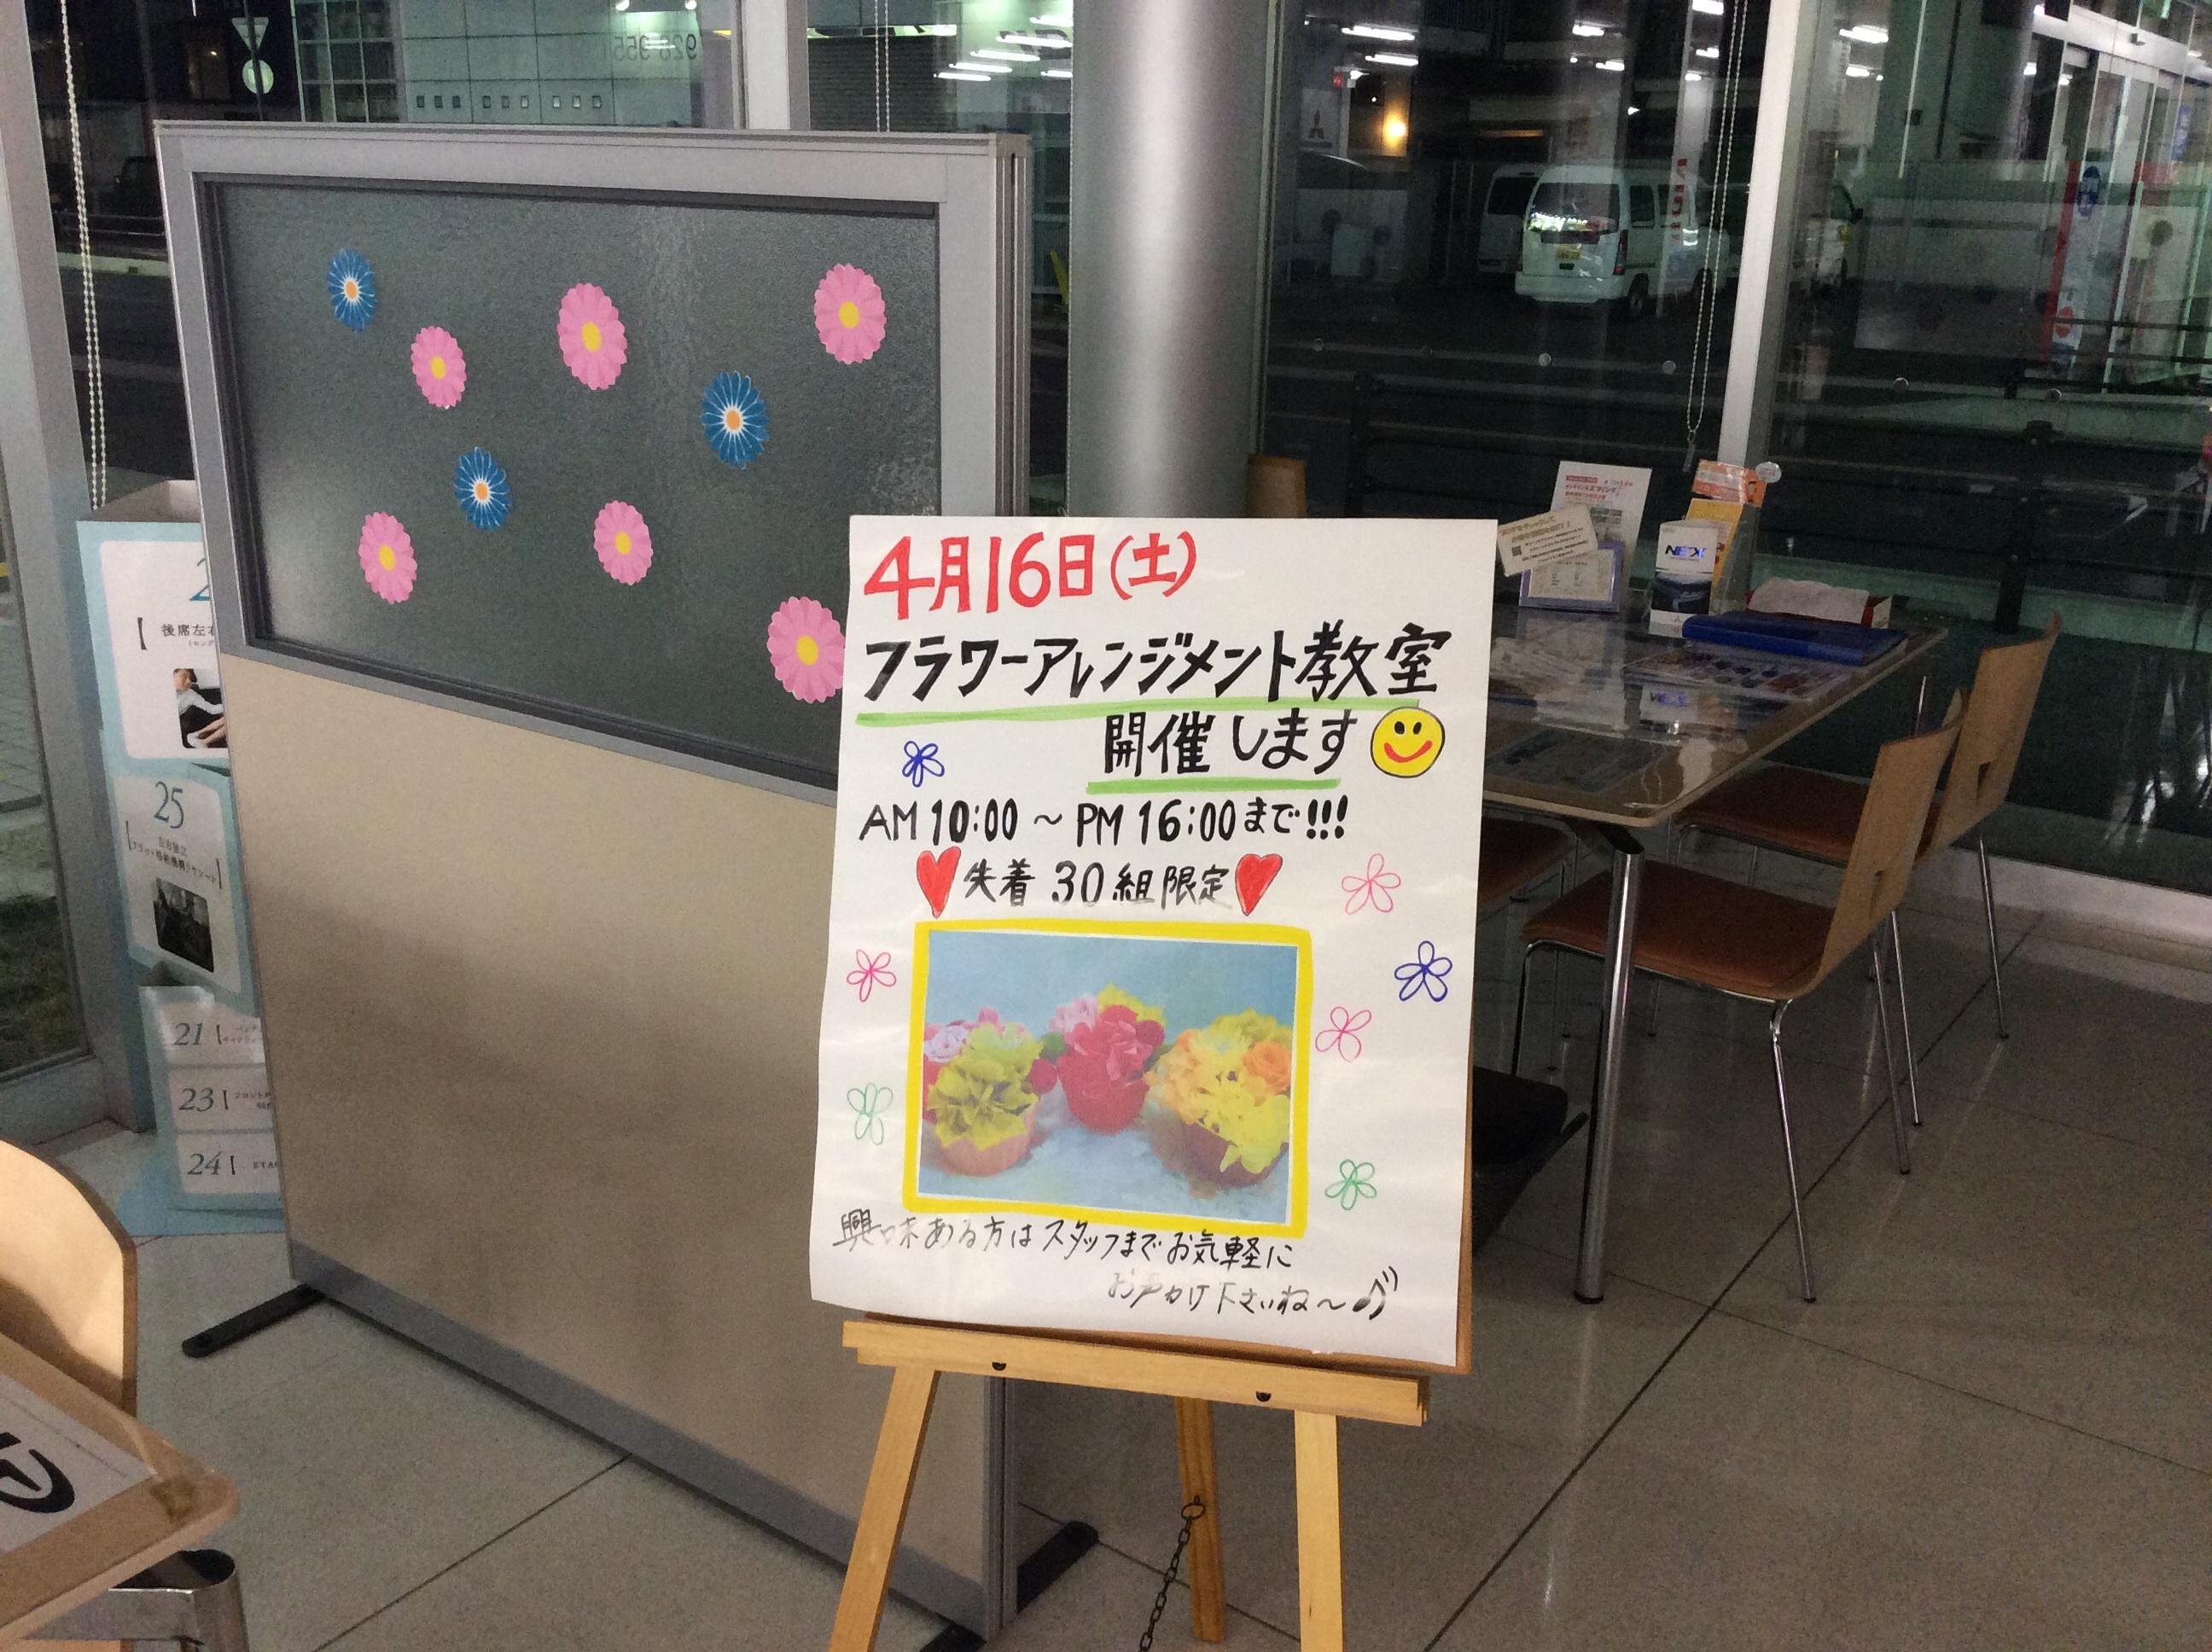 https://www.hyogo-mitsubishi.com/shop/akashi/files/2b62e7d48b4e7c2f4685ce83831735ba2d7103d9.jpg